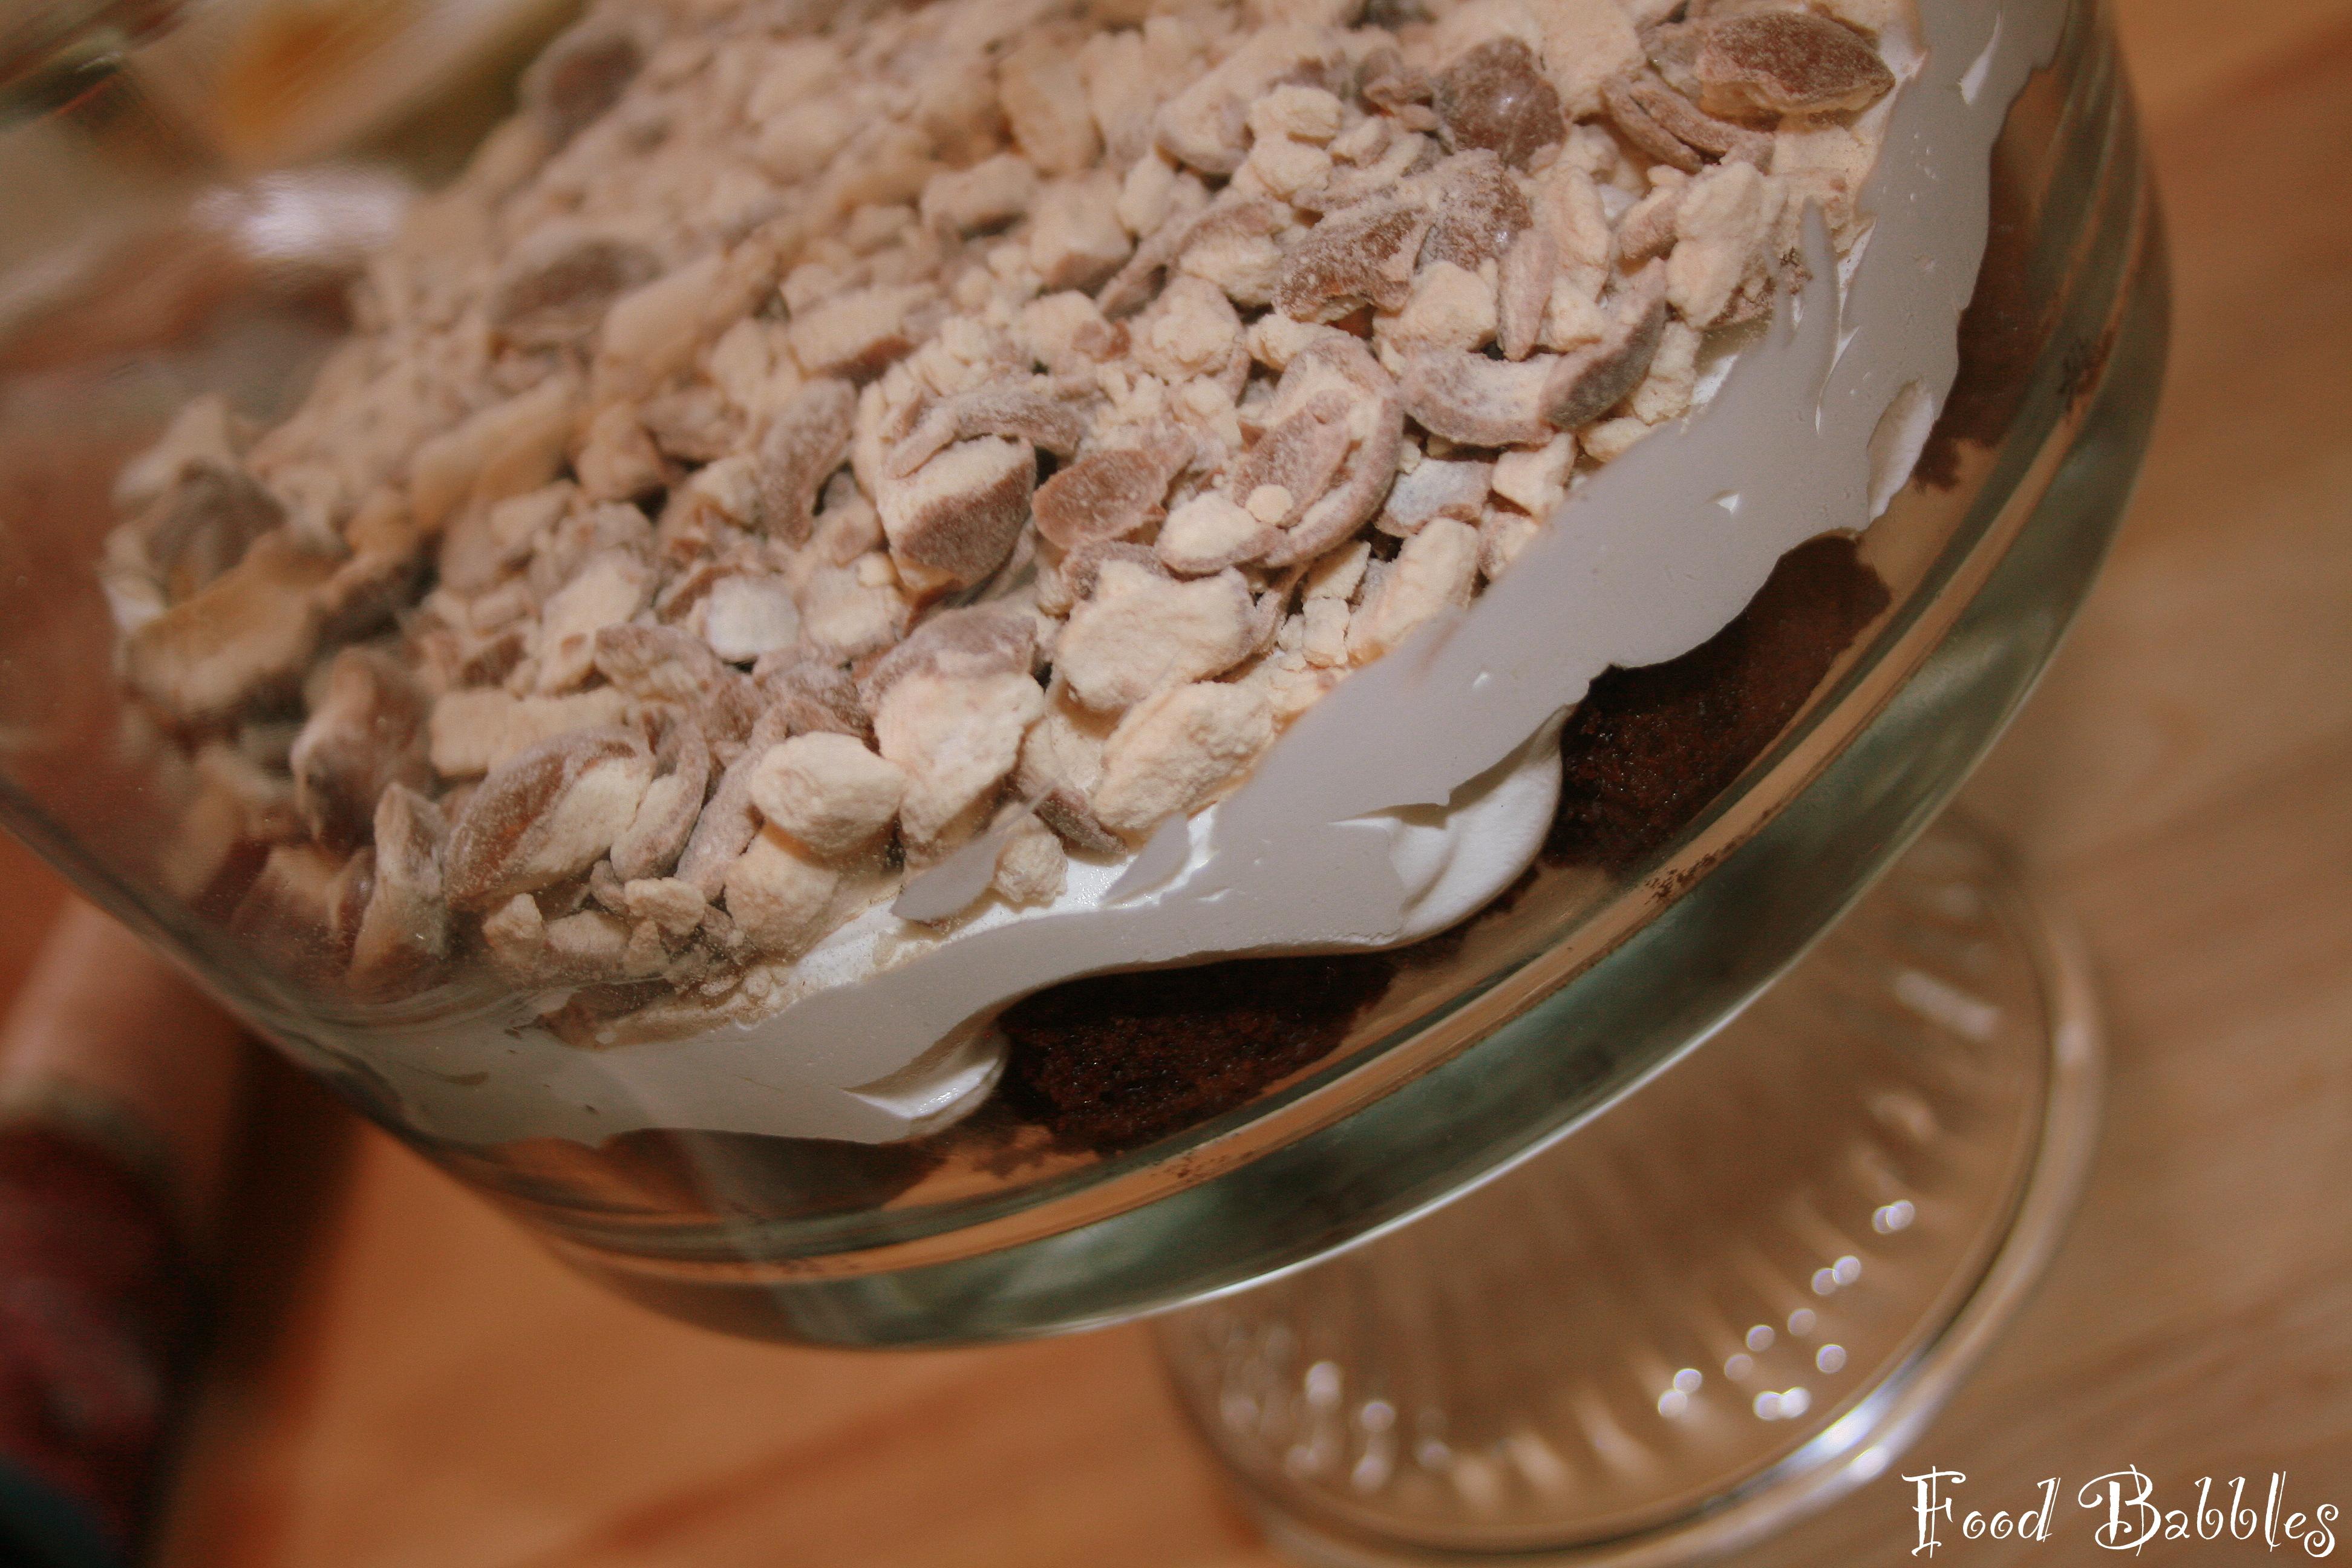 Cake, whipped cream, Whoppers... making something delightful!